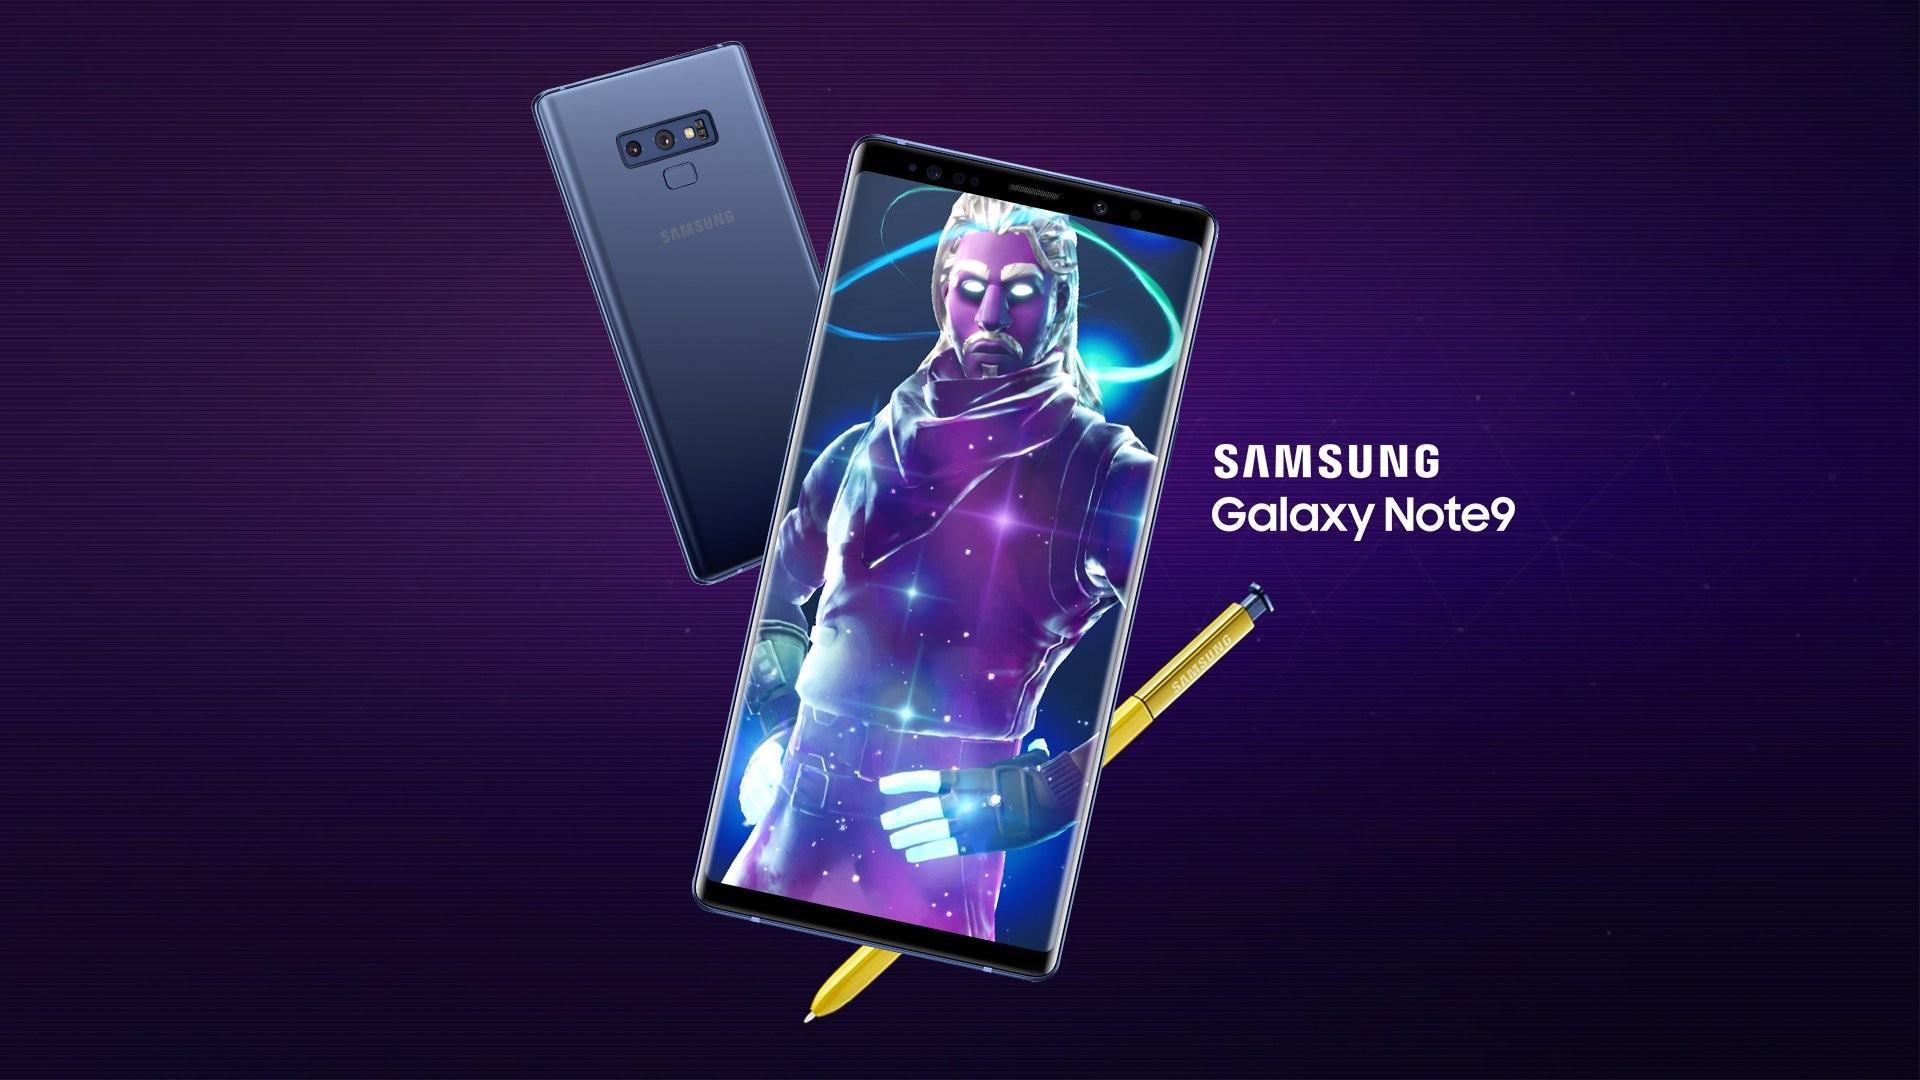 Galaxy Note 9 update timeline